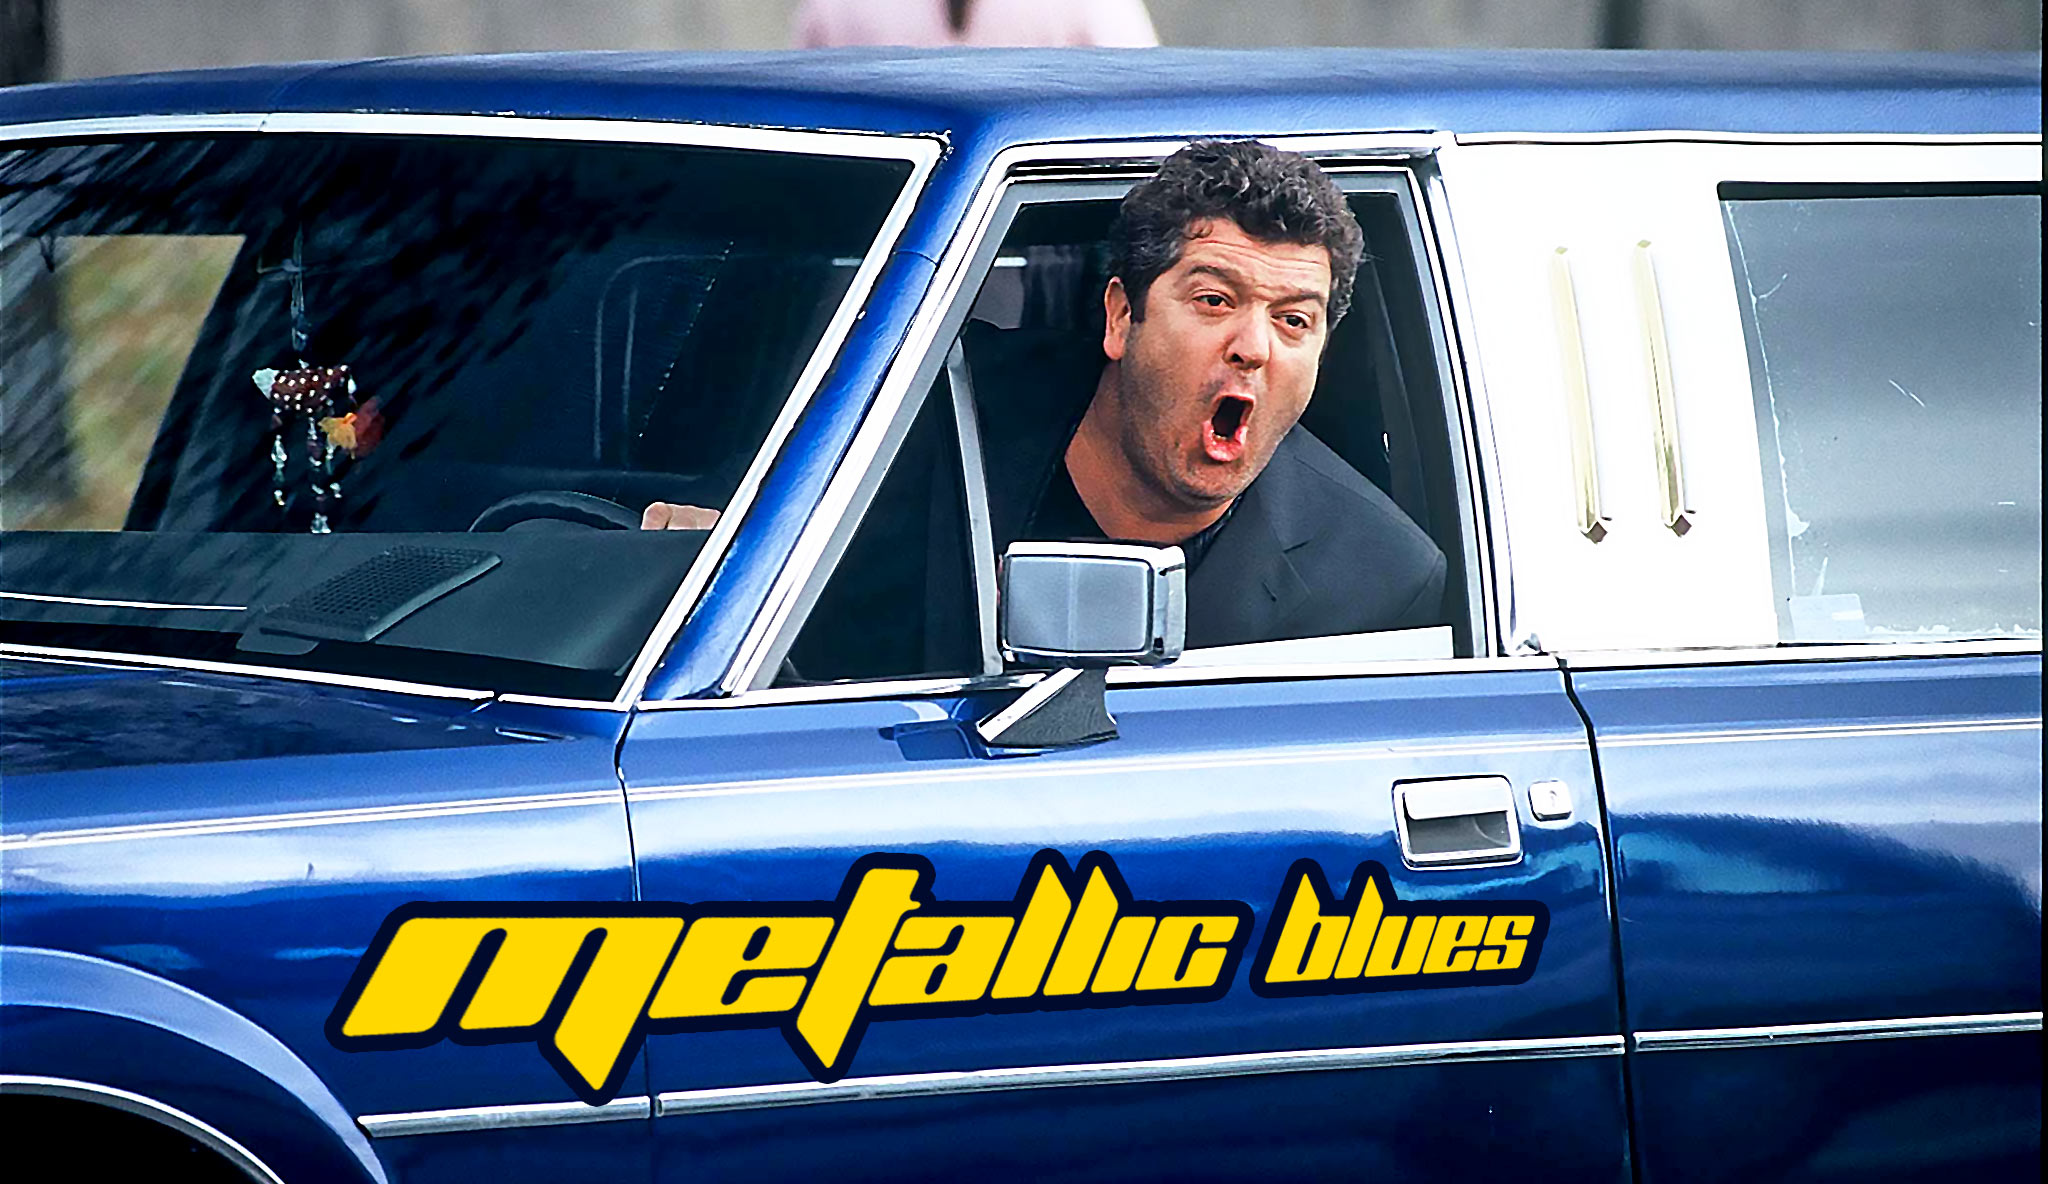 metallic-blues\header.jpg